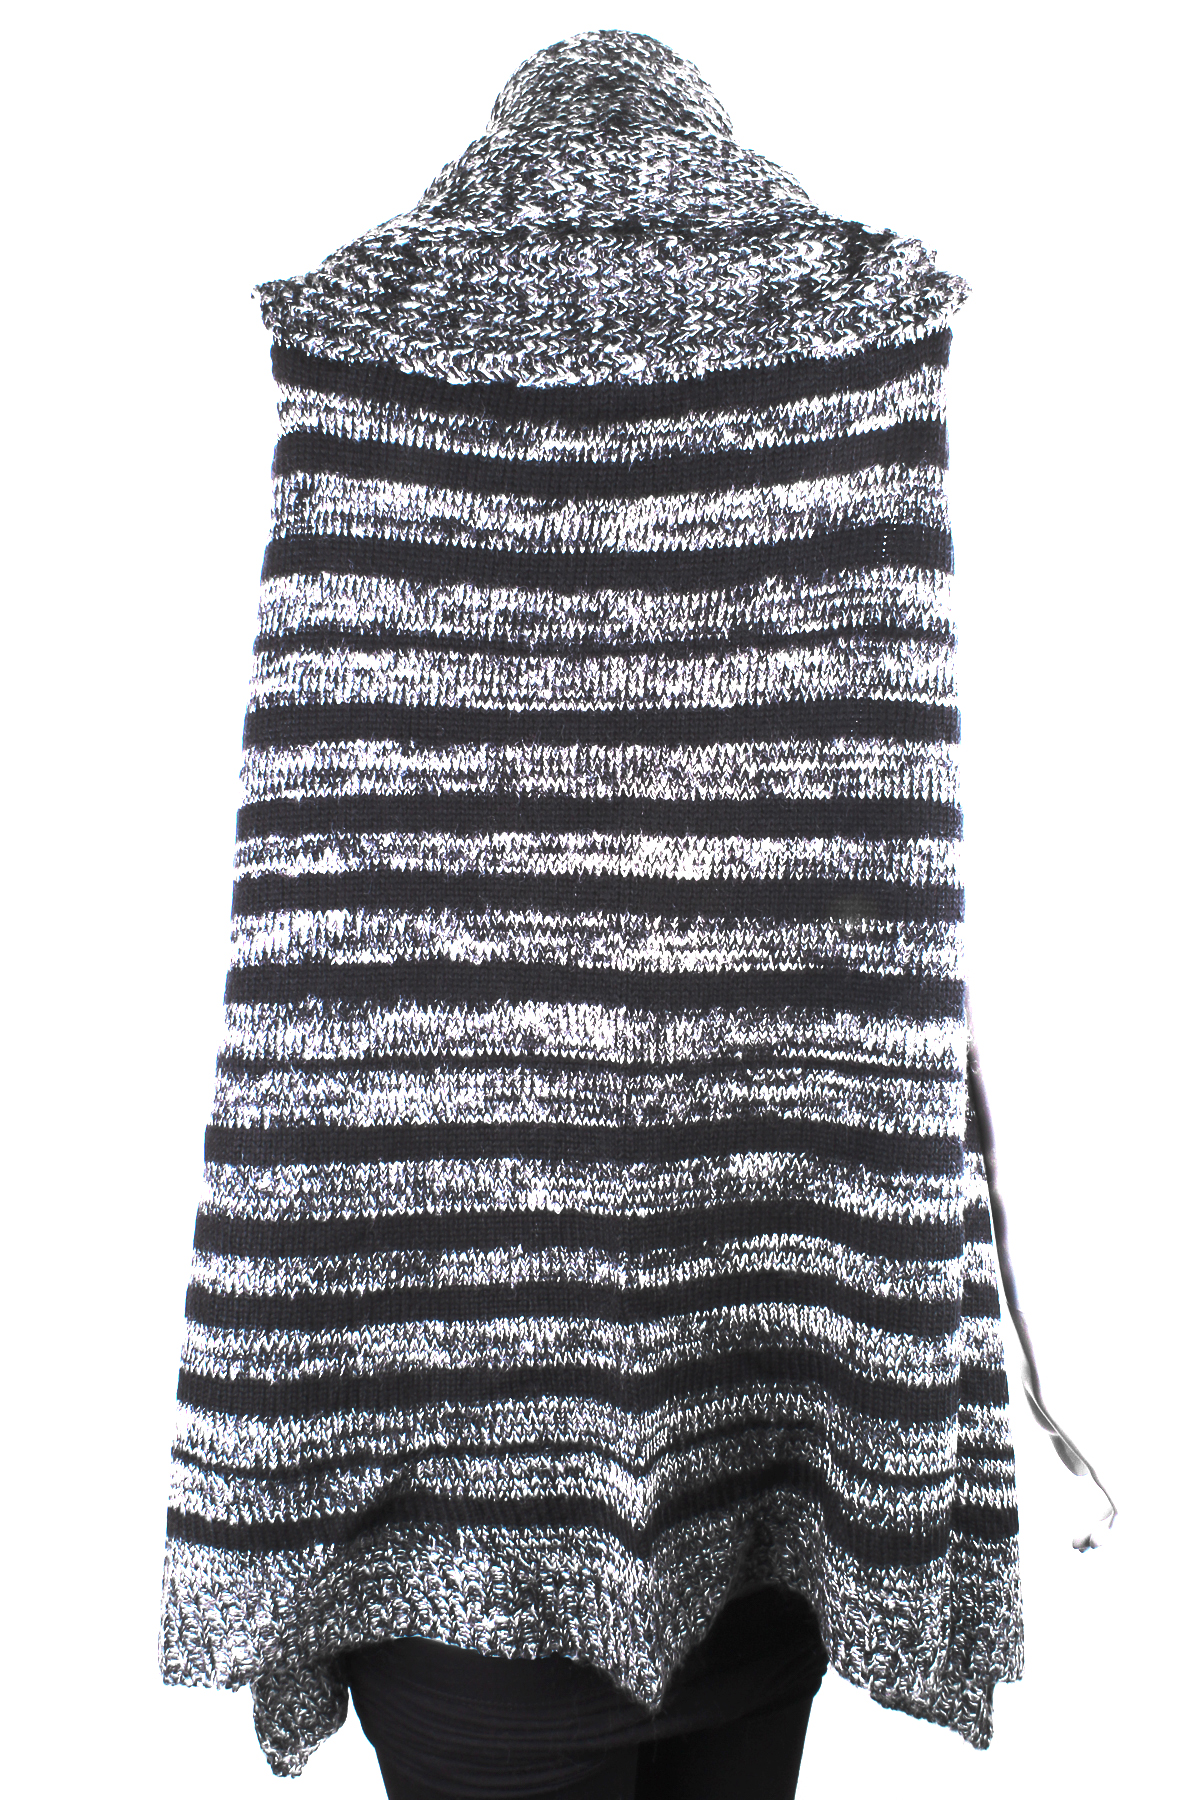 Knitting Pattern Striped Poncho : Knit Striped Poncho - Scarves